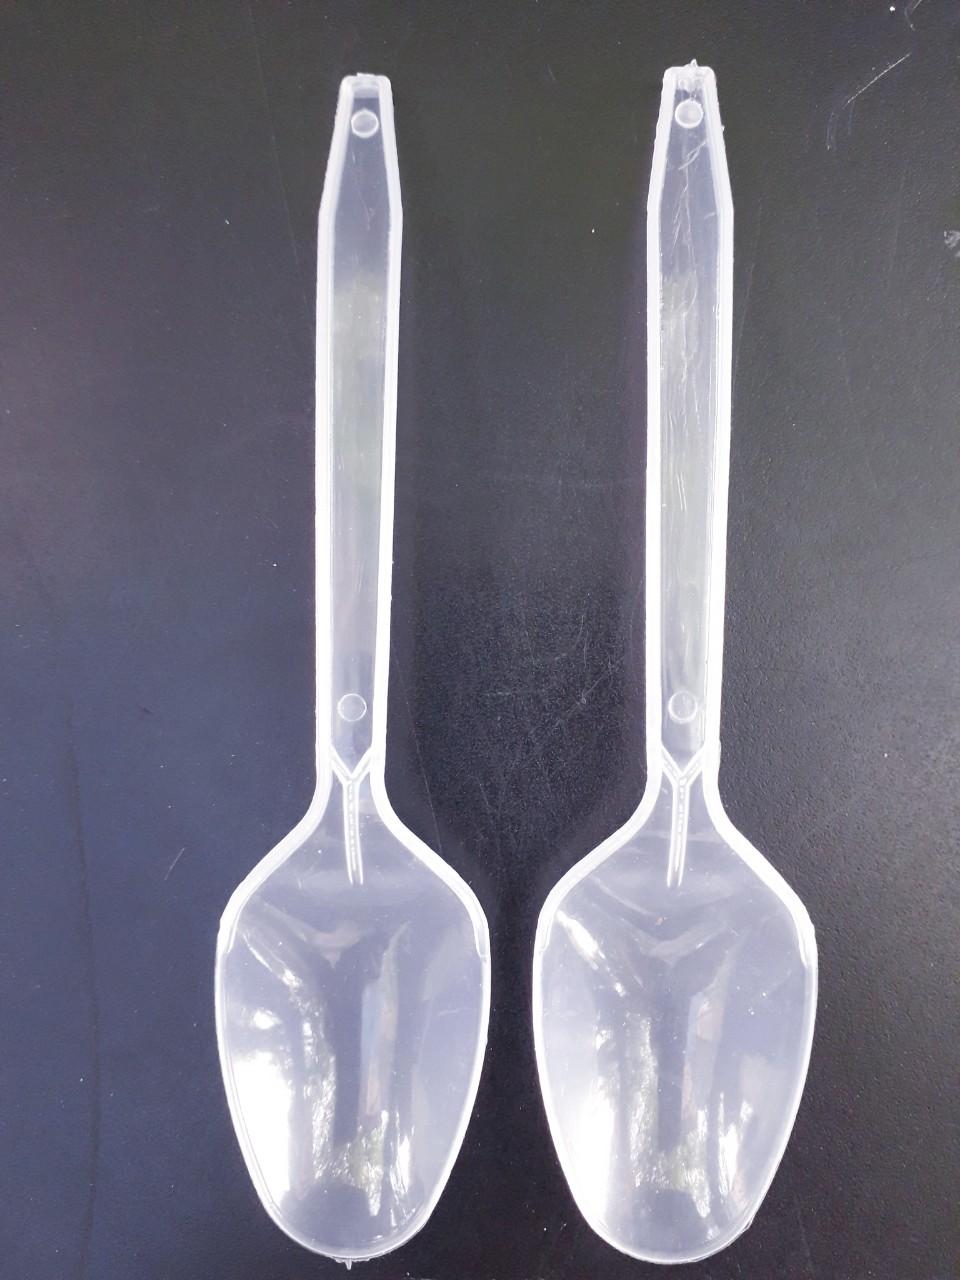 Muống nhựa